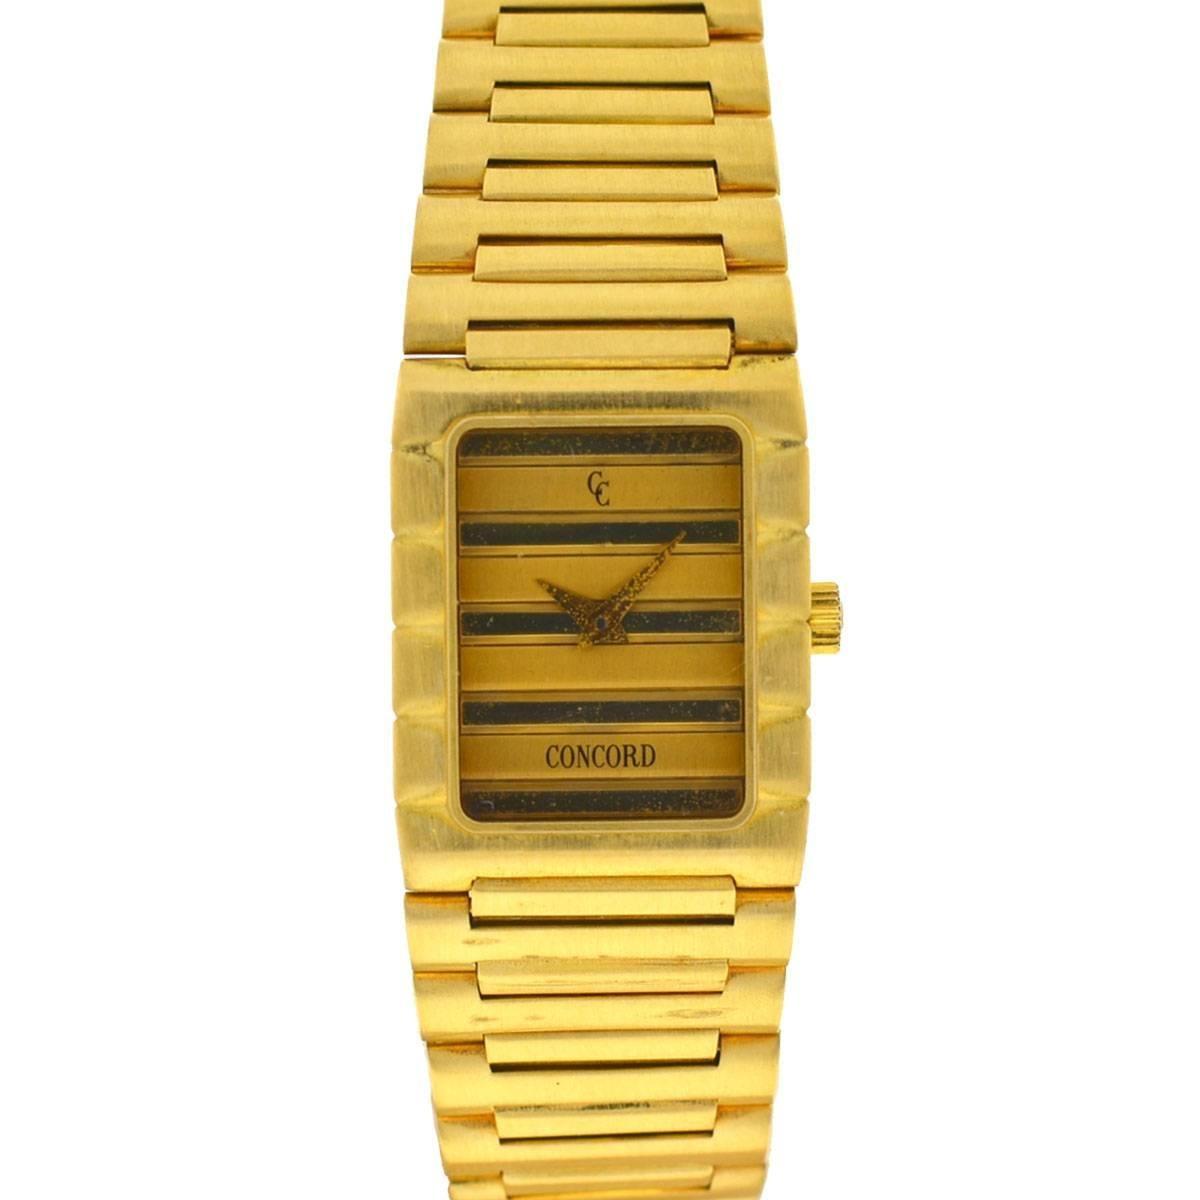 Vintage Concord Dameuri Watch 18 Karat Yellow Gold Ladies Quartz